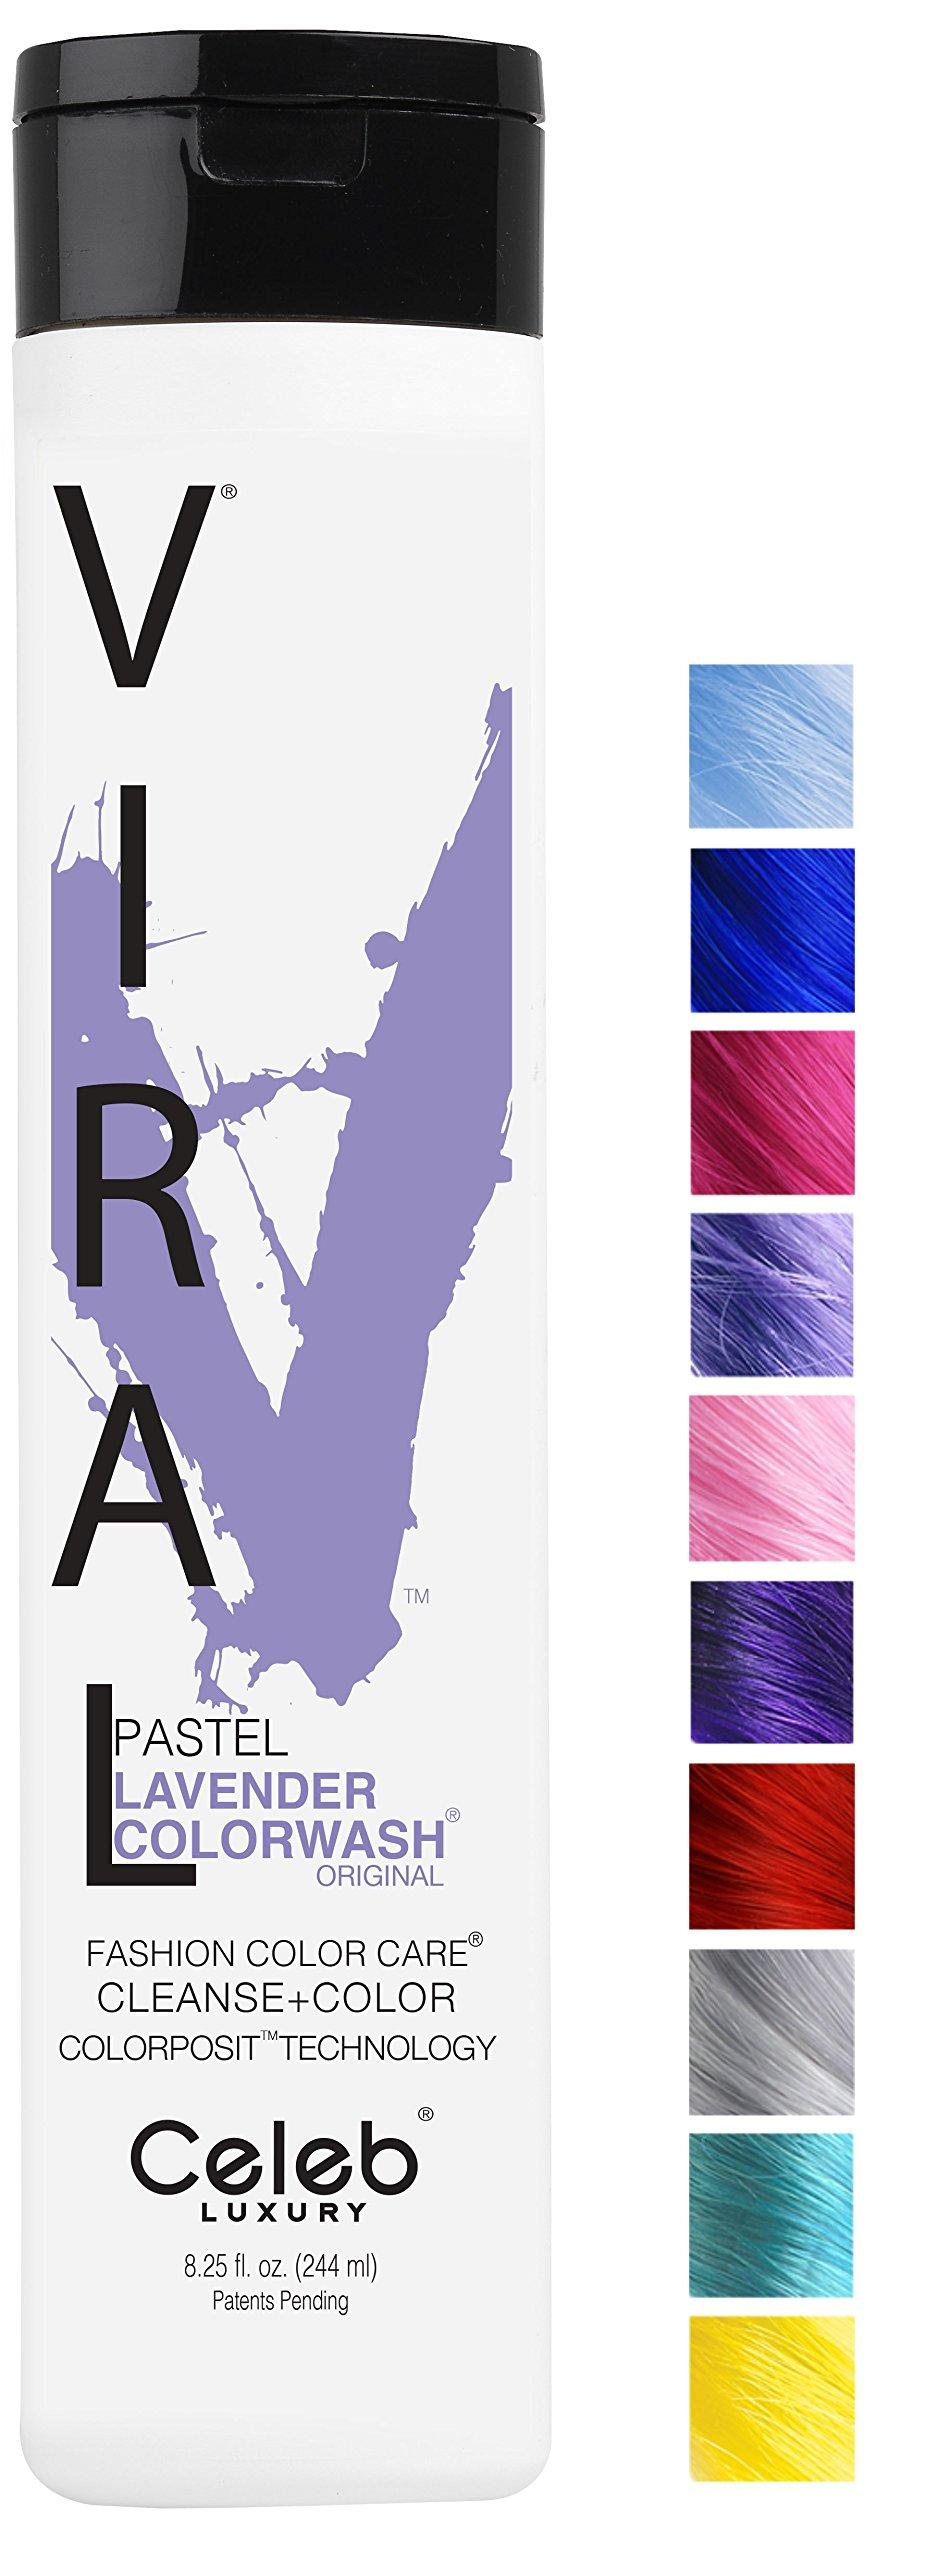 Viral Pastel Lavender Colorwash, 8.25oz by Celeb Luxury